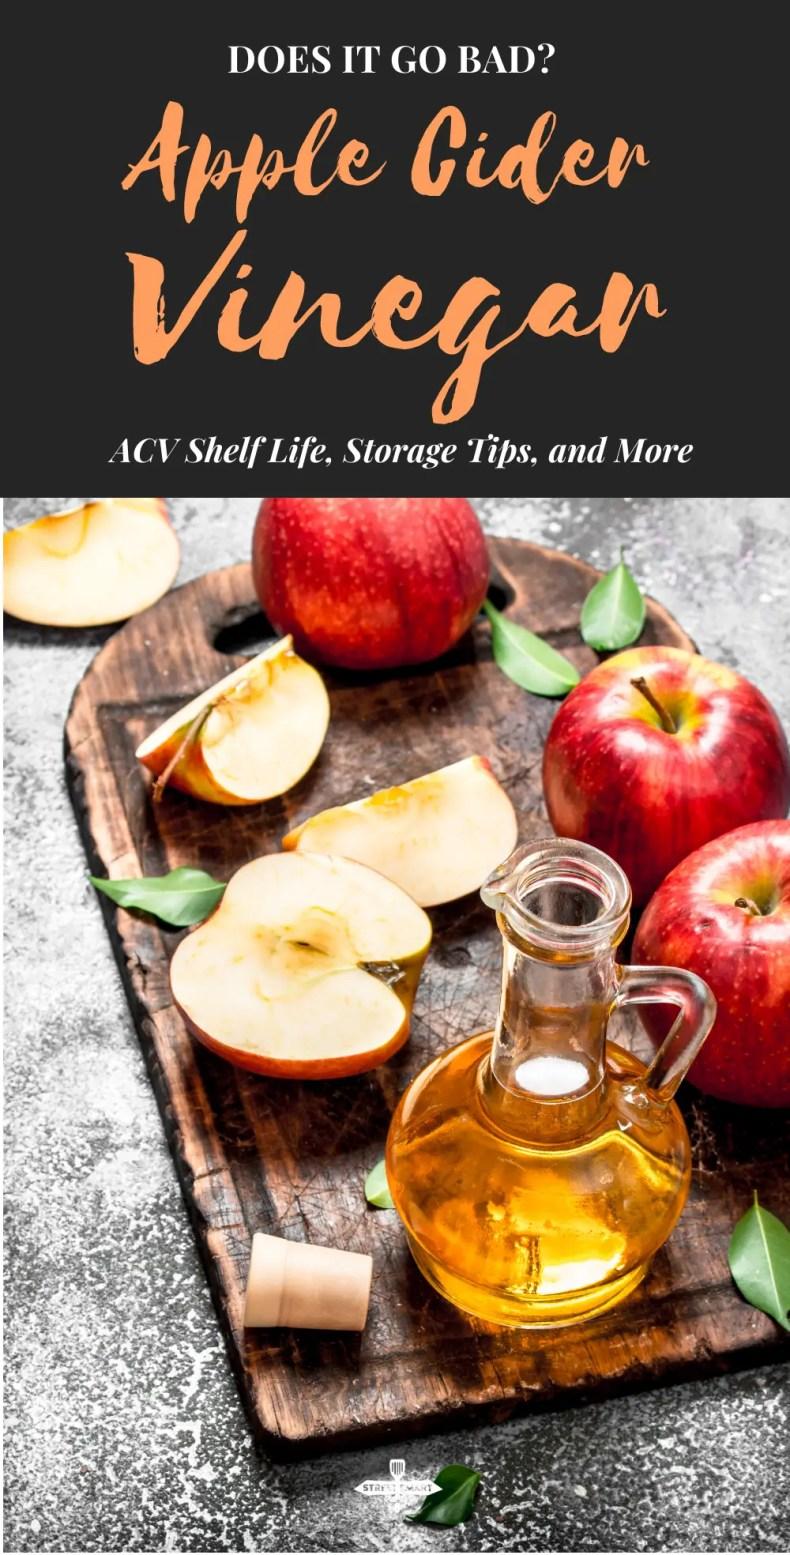 Does Apple Cider Vinegar Go Bad pin